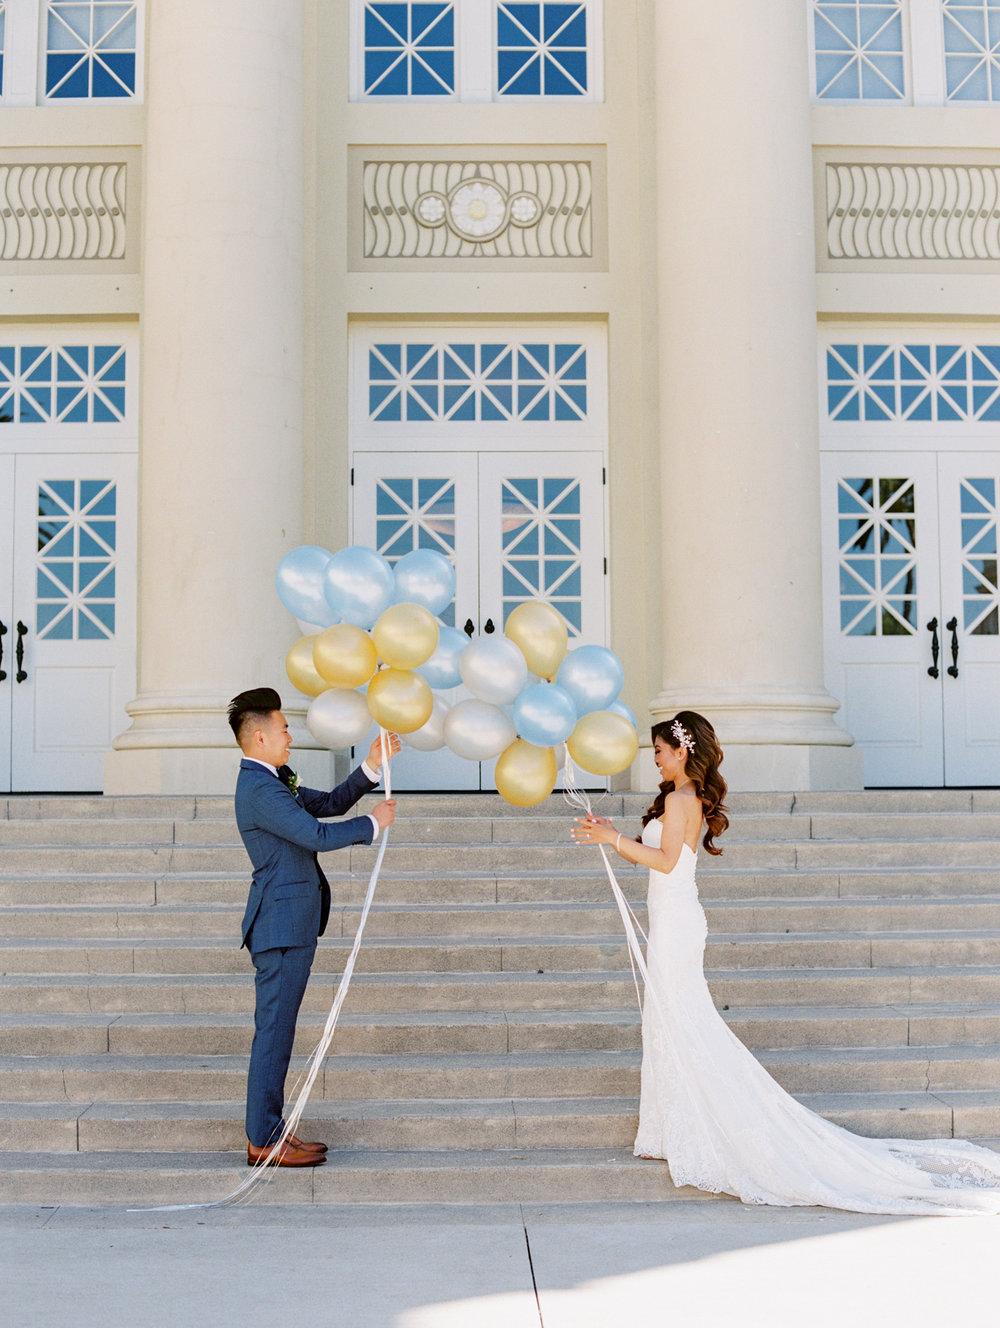 ChristineDomJonCu-Film-Wedding-Photographer13.jpg